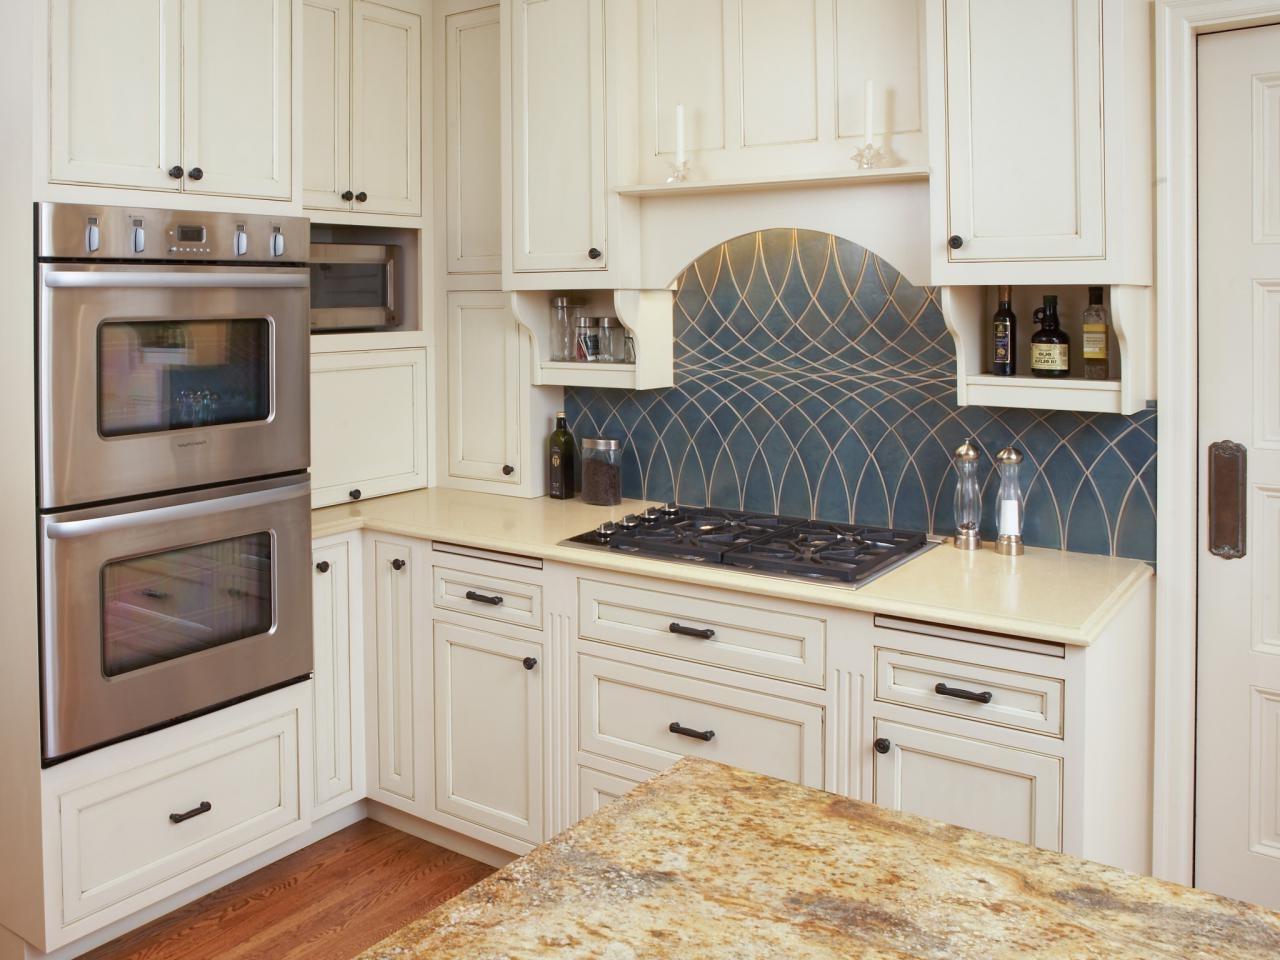 country kitchen backsplash designs photo - 9